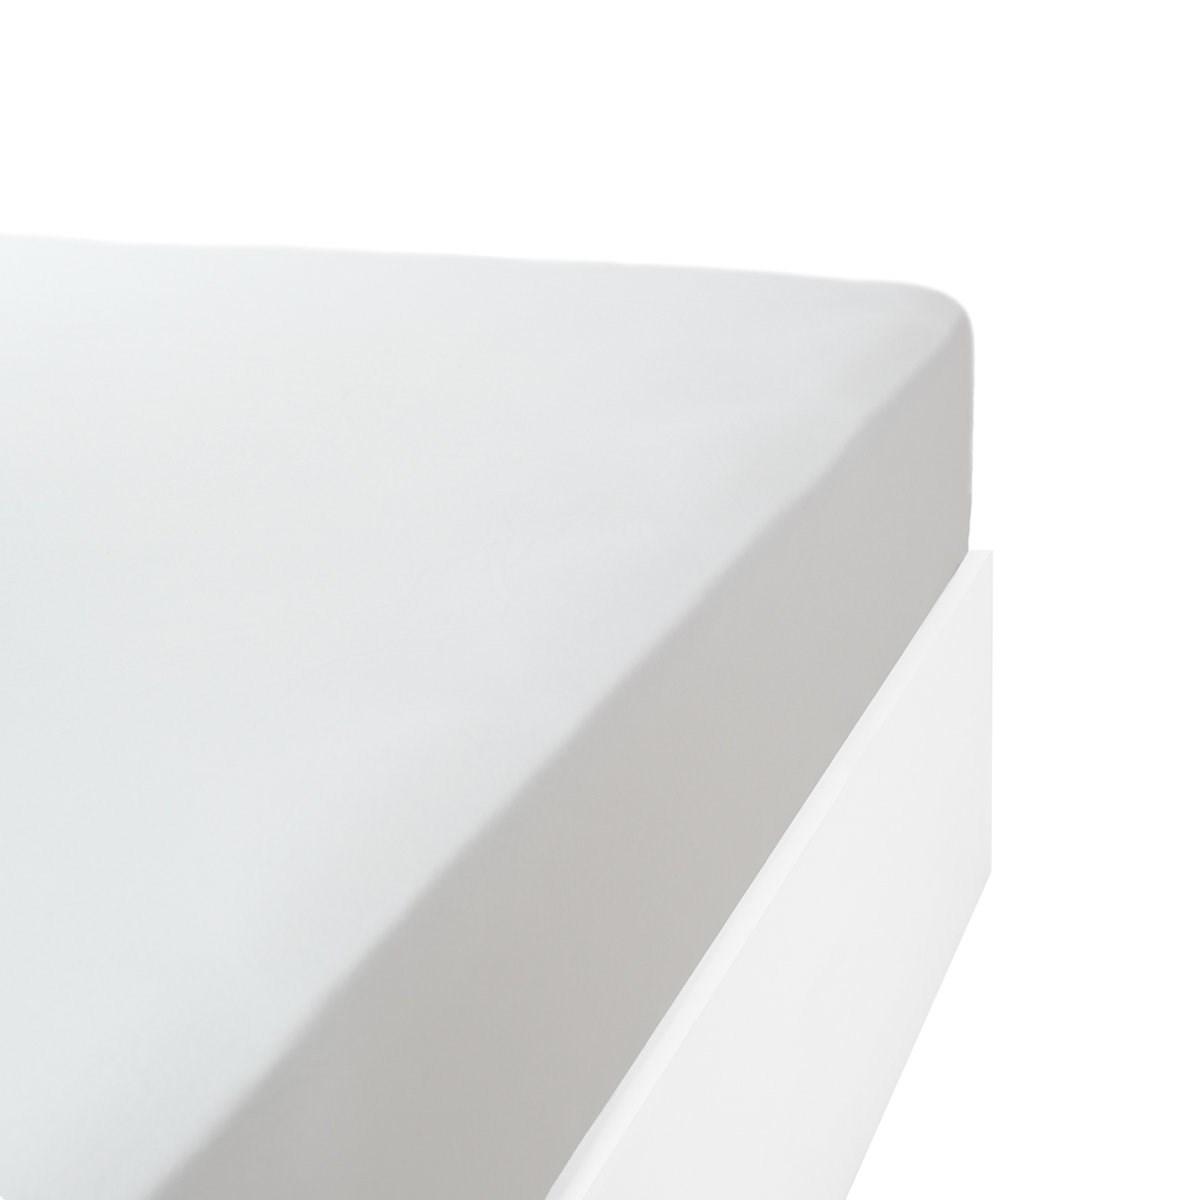 Drap housse jersey extensible en coton blanc 110x190 cm